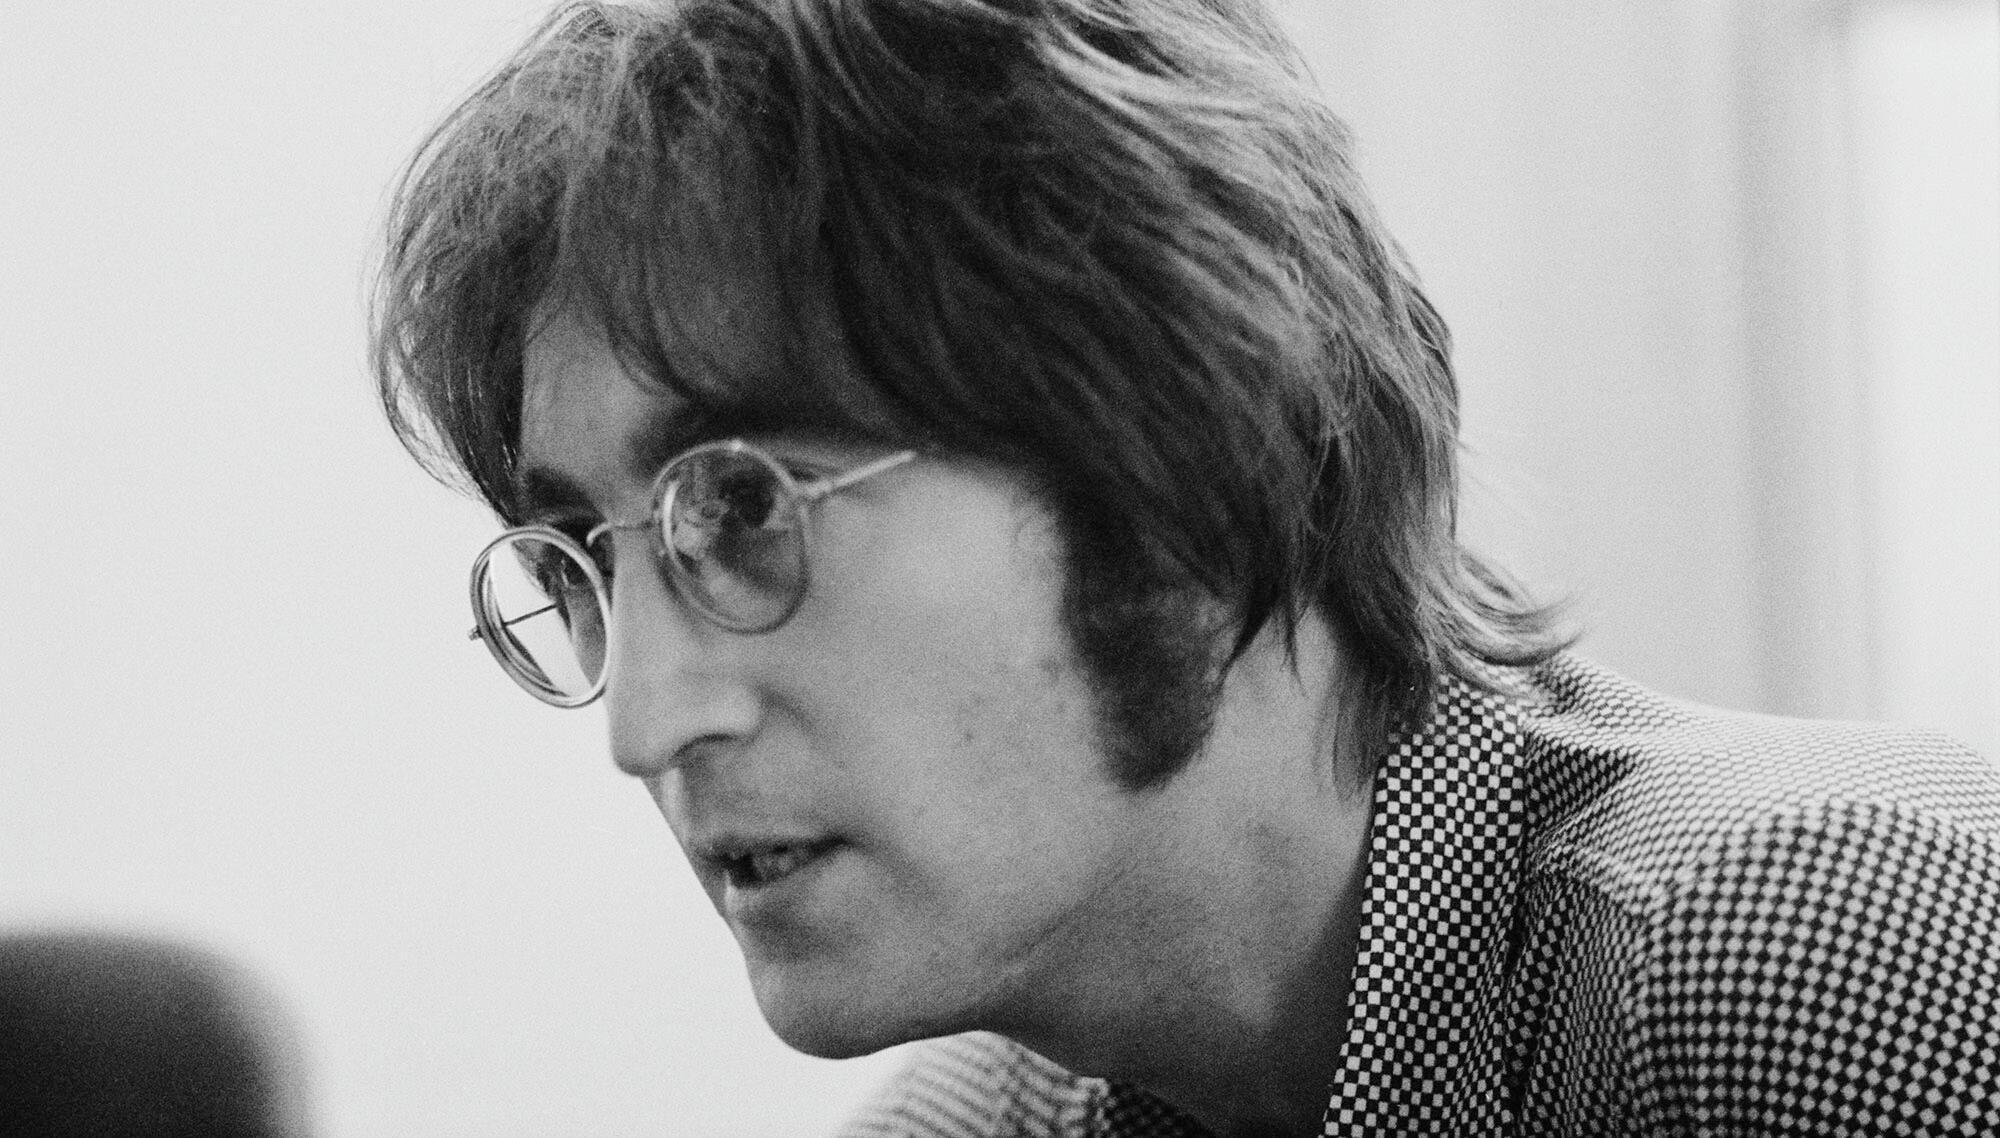 John Lennon Remembered On His 80th Birthday